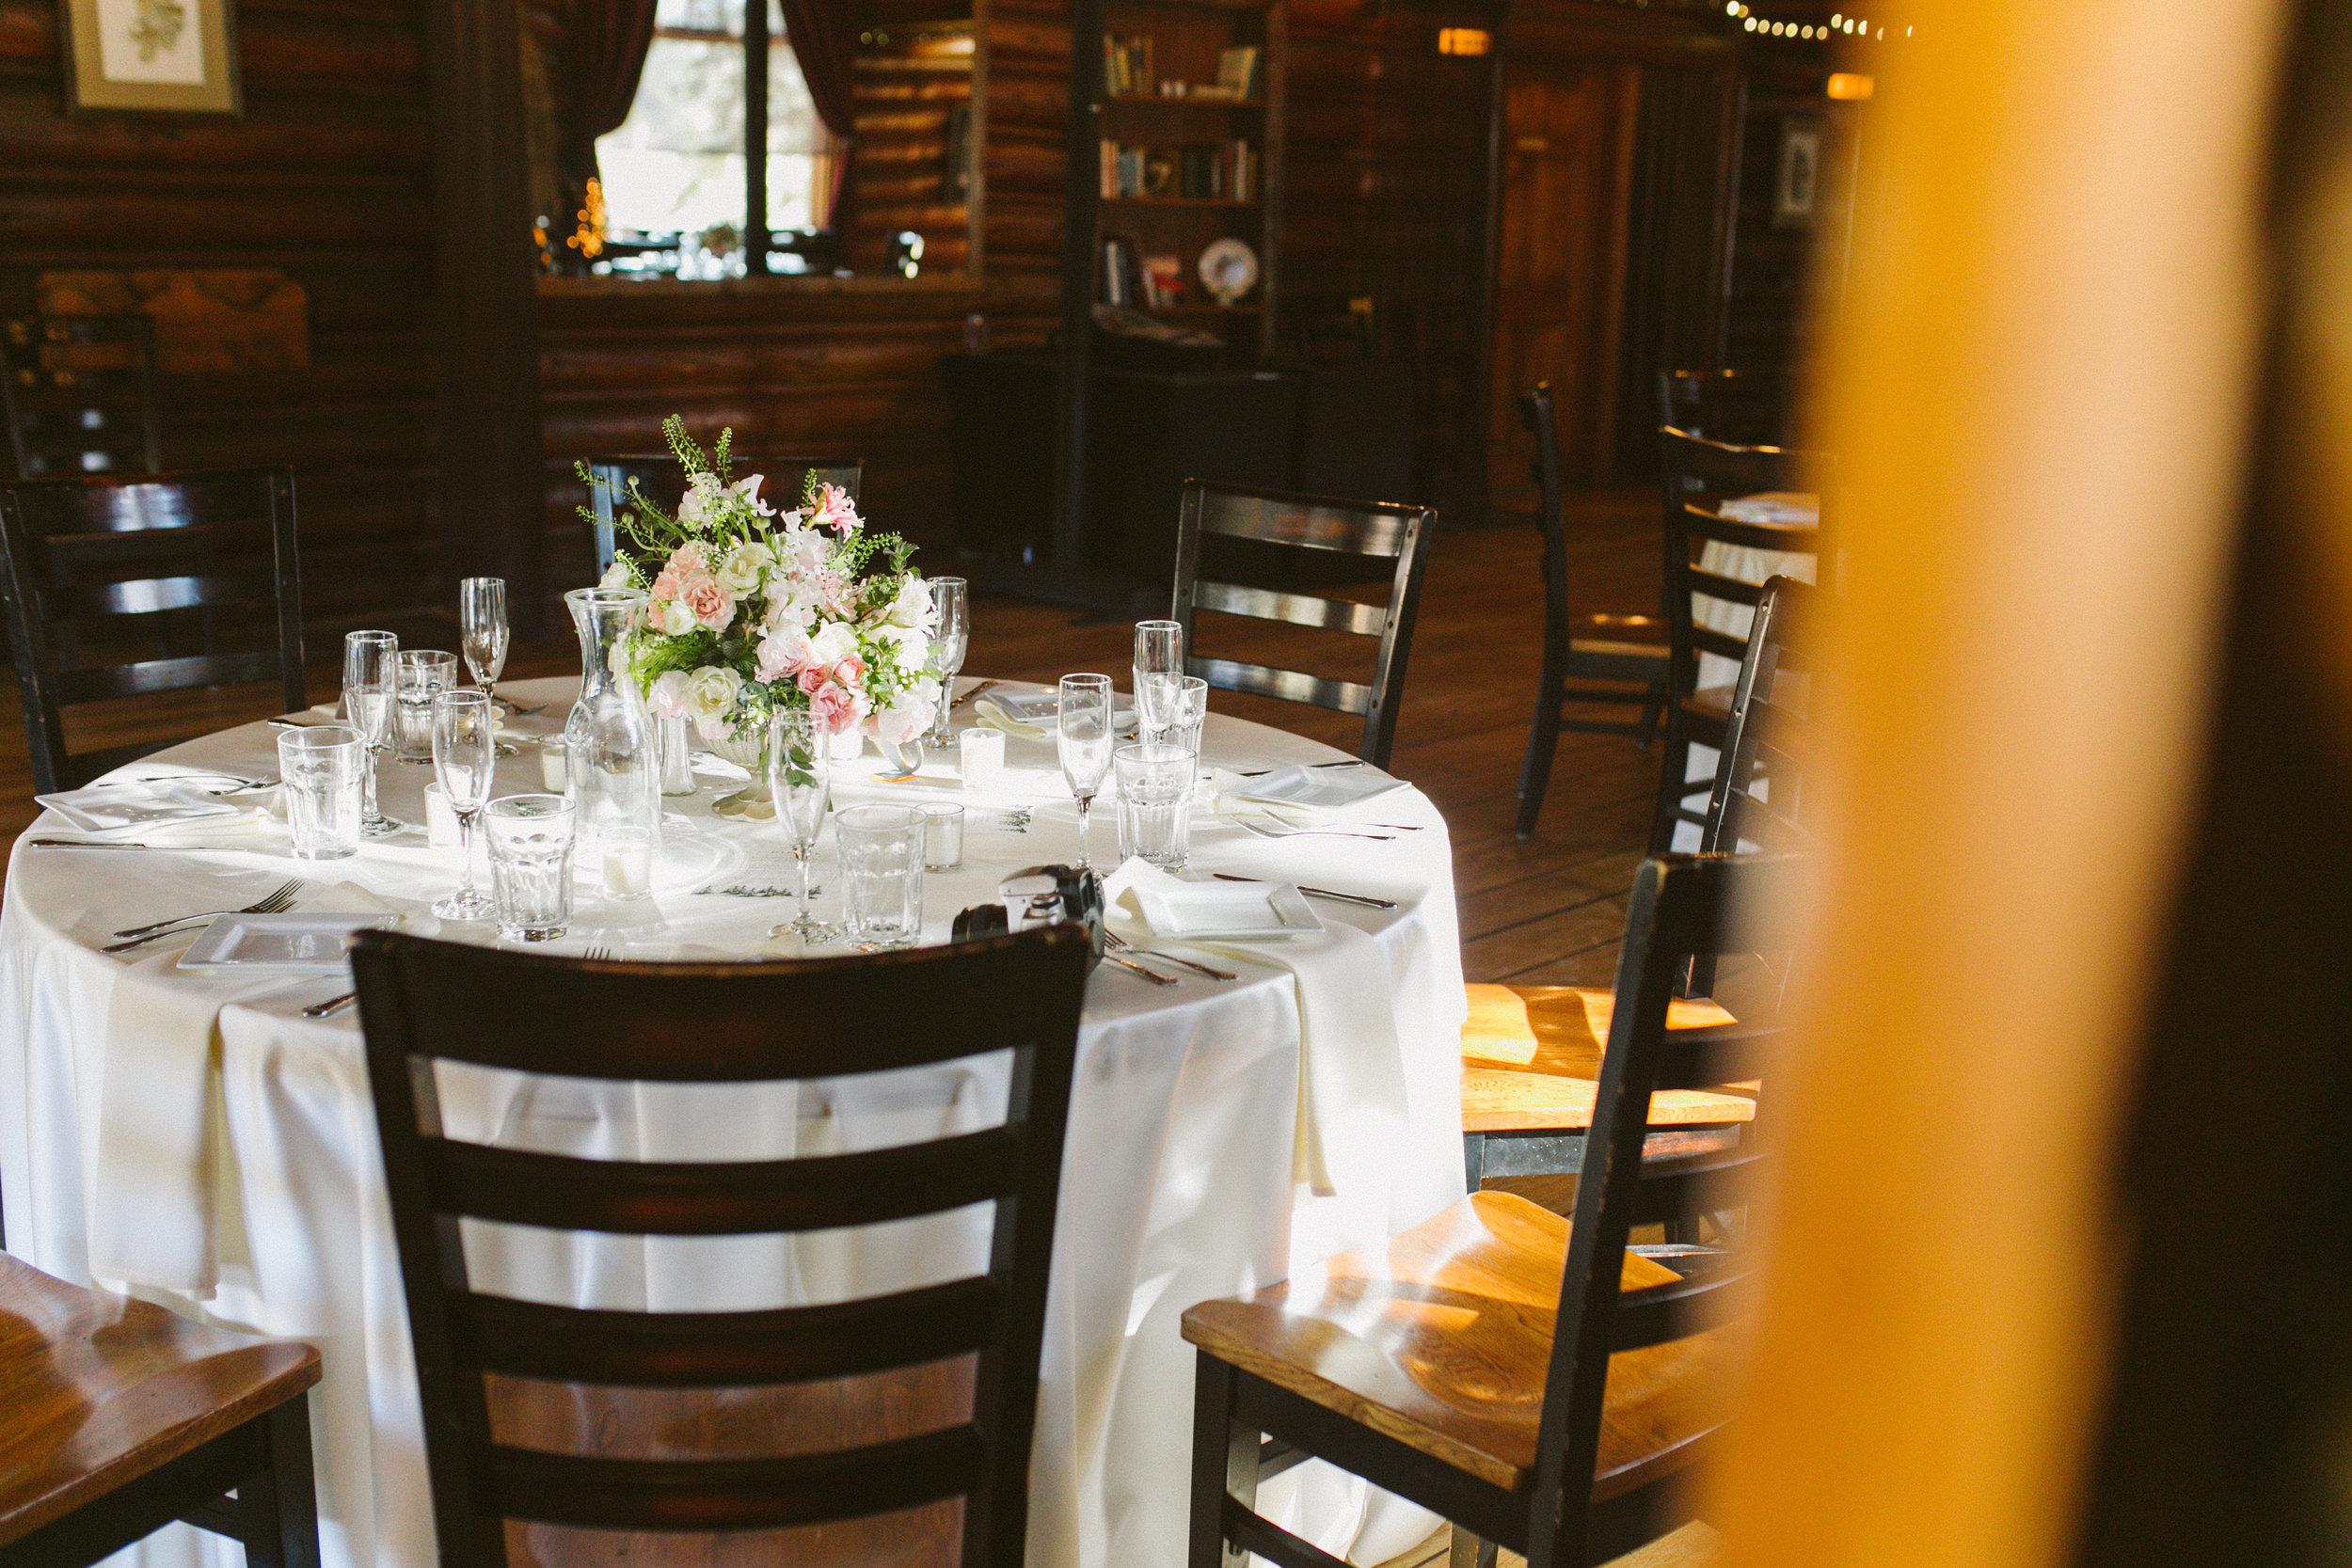 Twin_Owls_Steakhouse-wedding_photographer_Estes_Park_Lisa_ODwyer-557.jpg